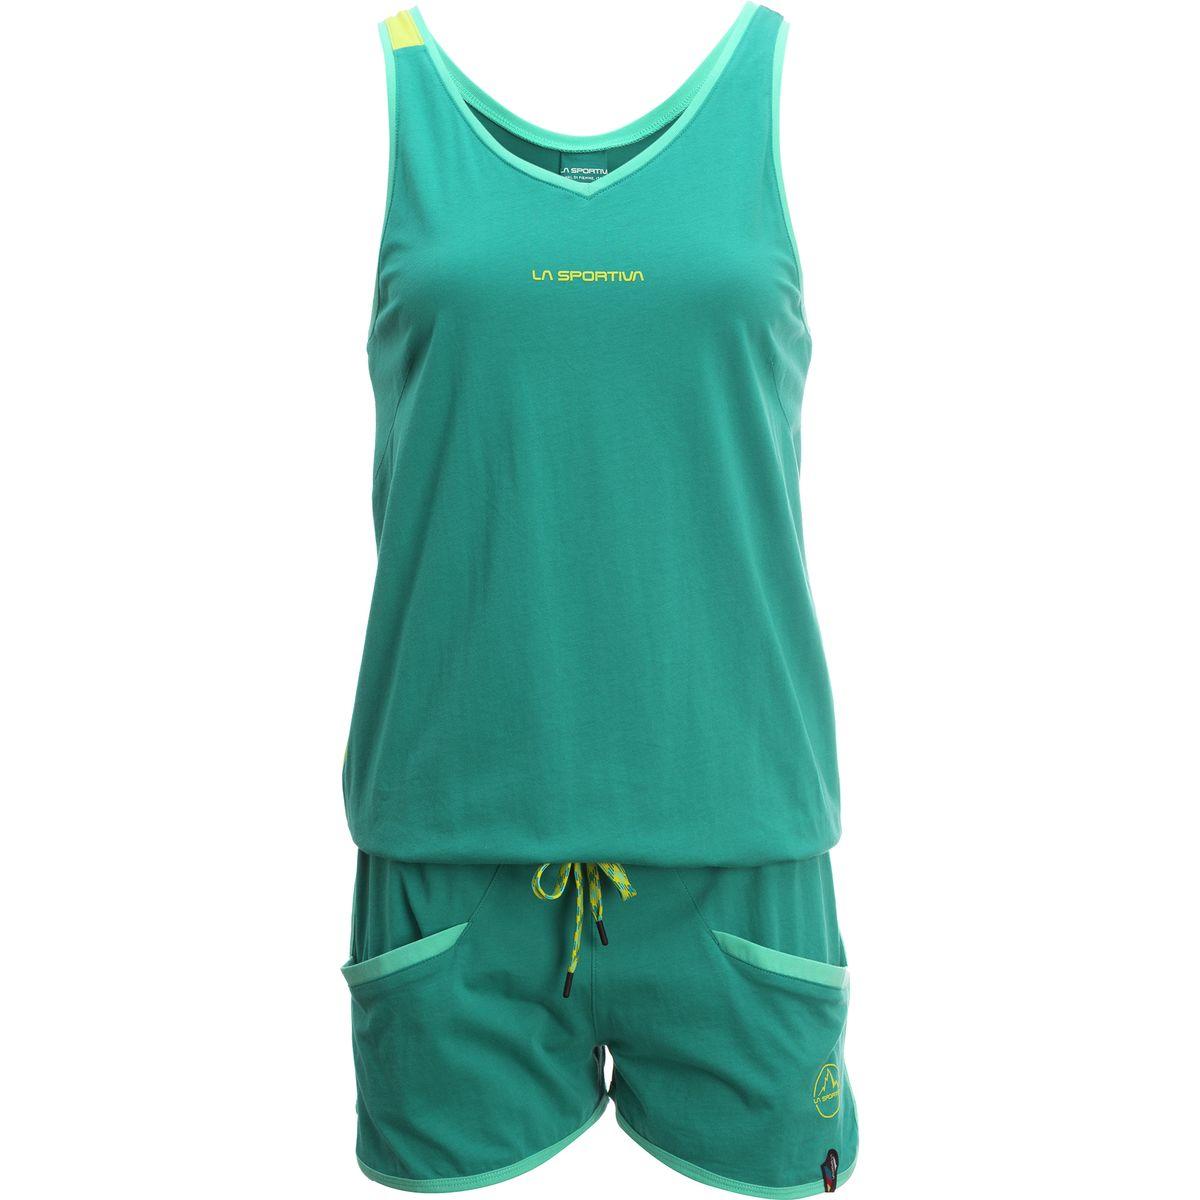 La Sportiva Flash Jumper - Women